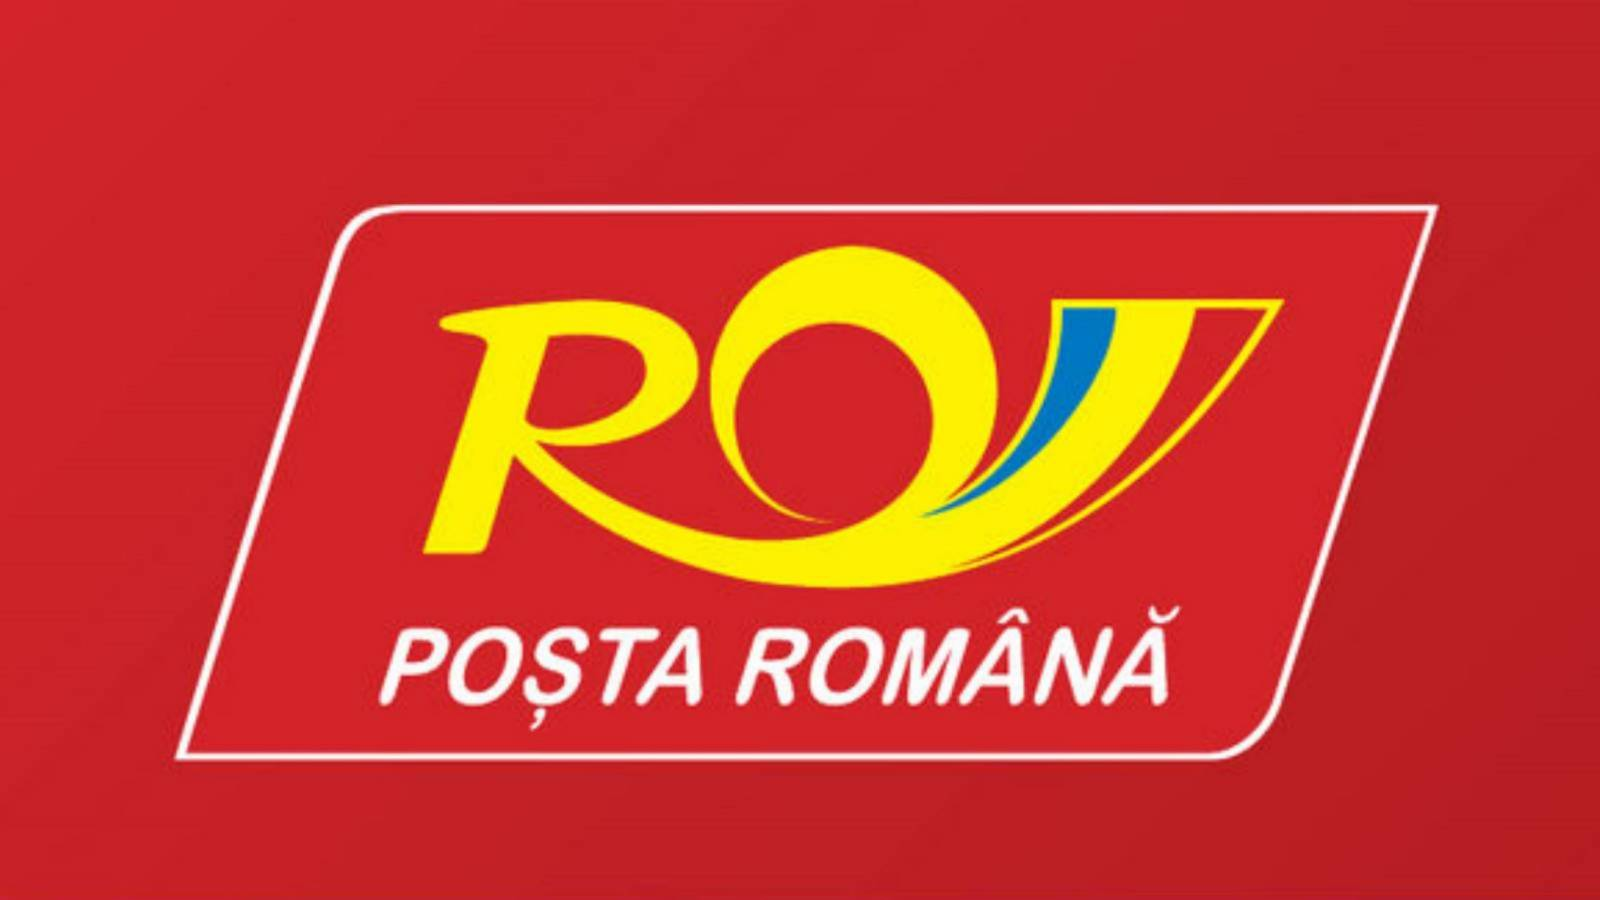 Atentionare Posta Romana obiecte interzise